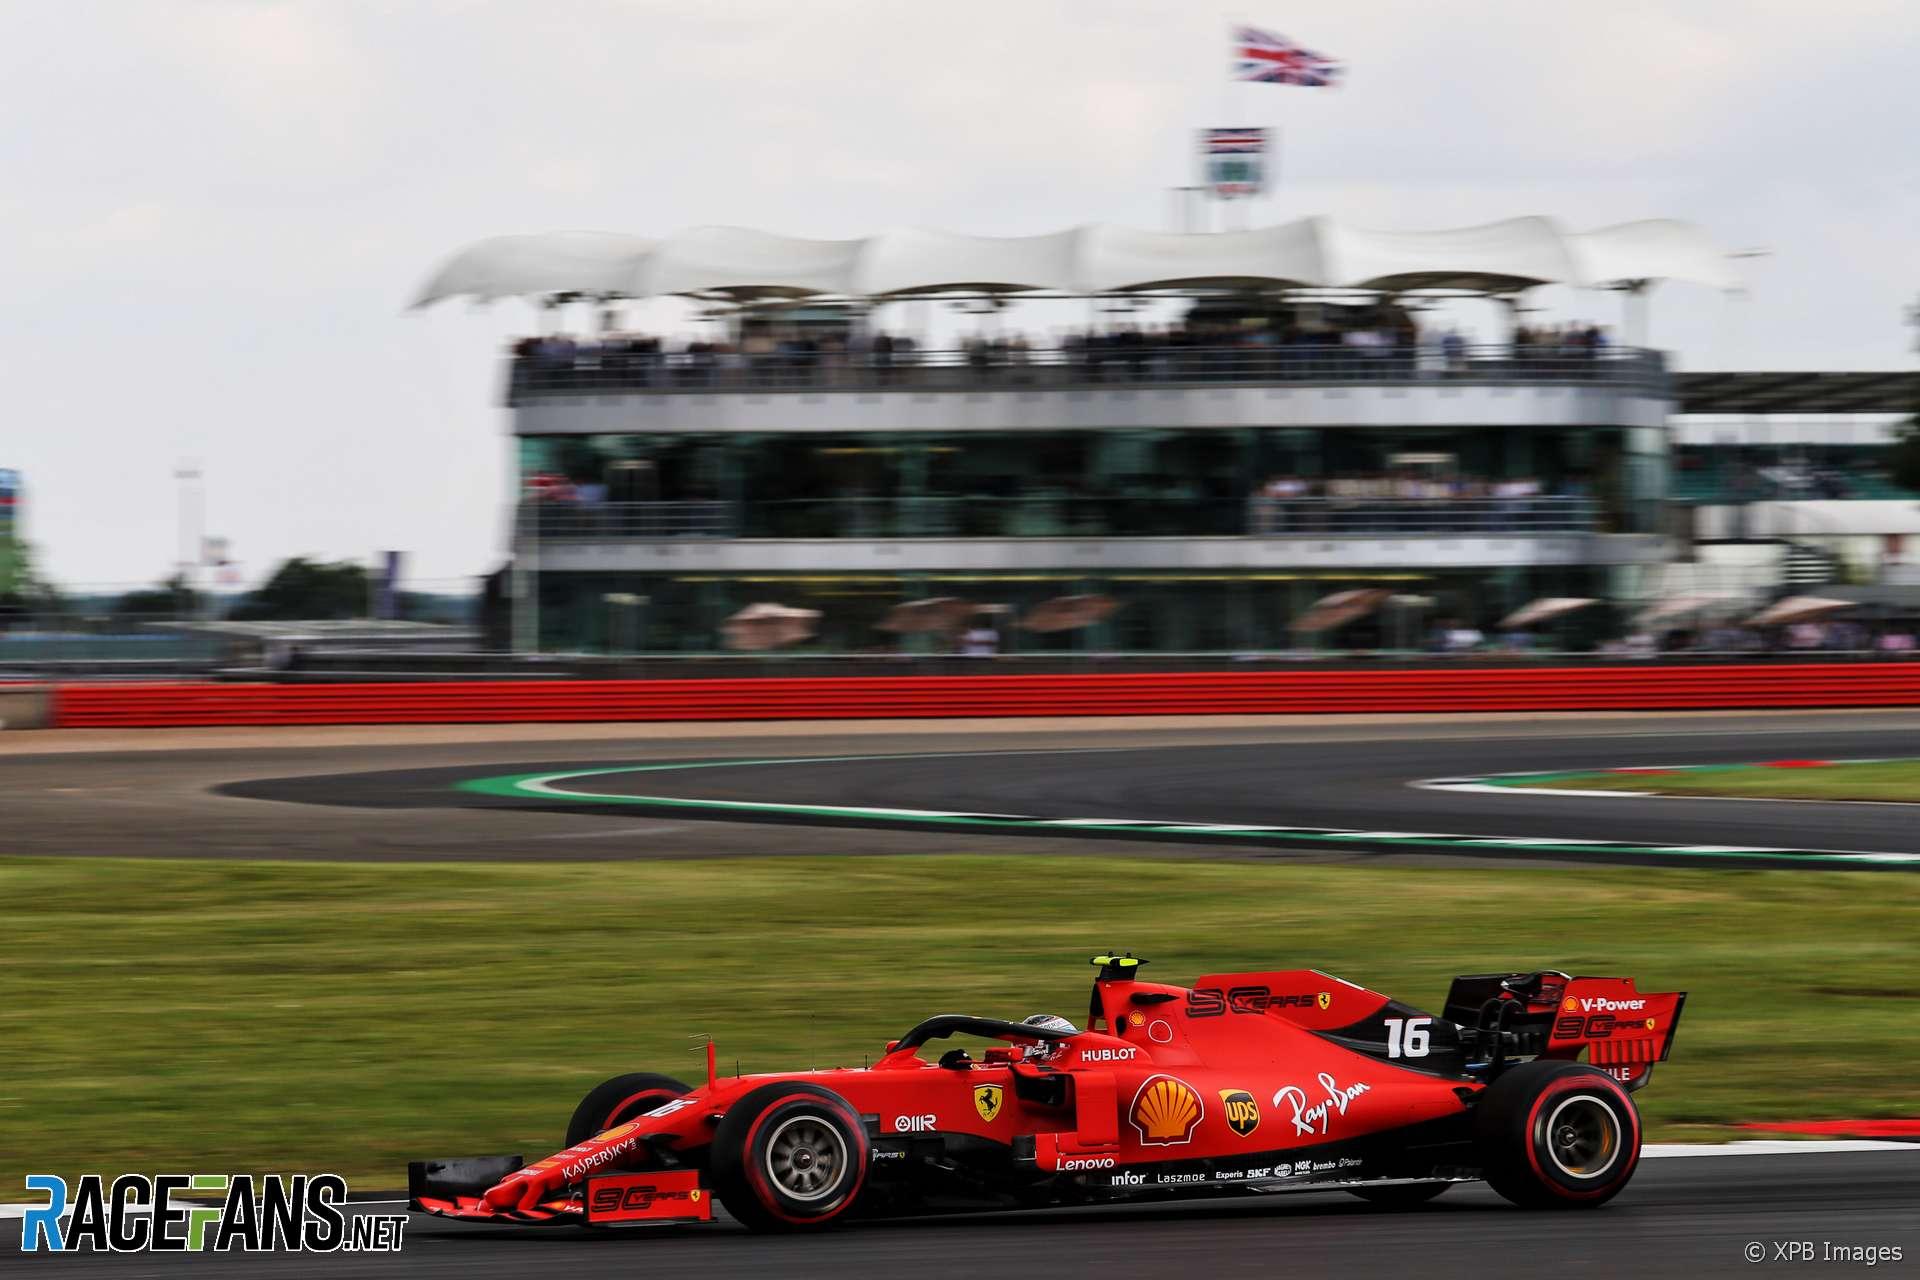 Charles Leclerc, Ferrari, Silverstone, 2019